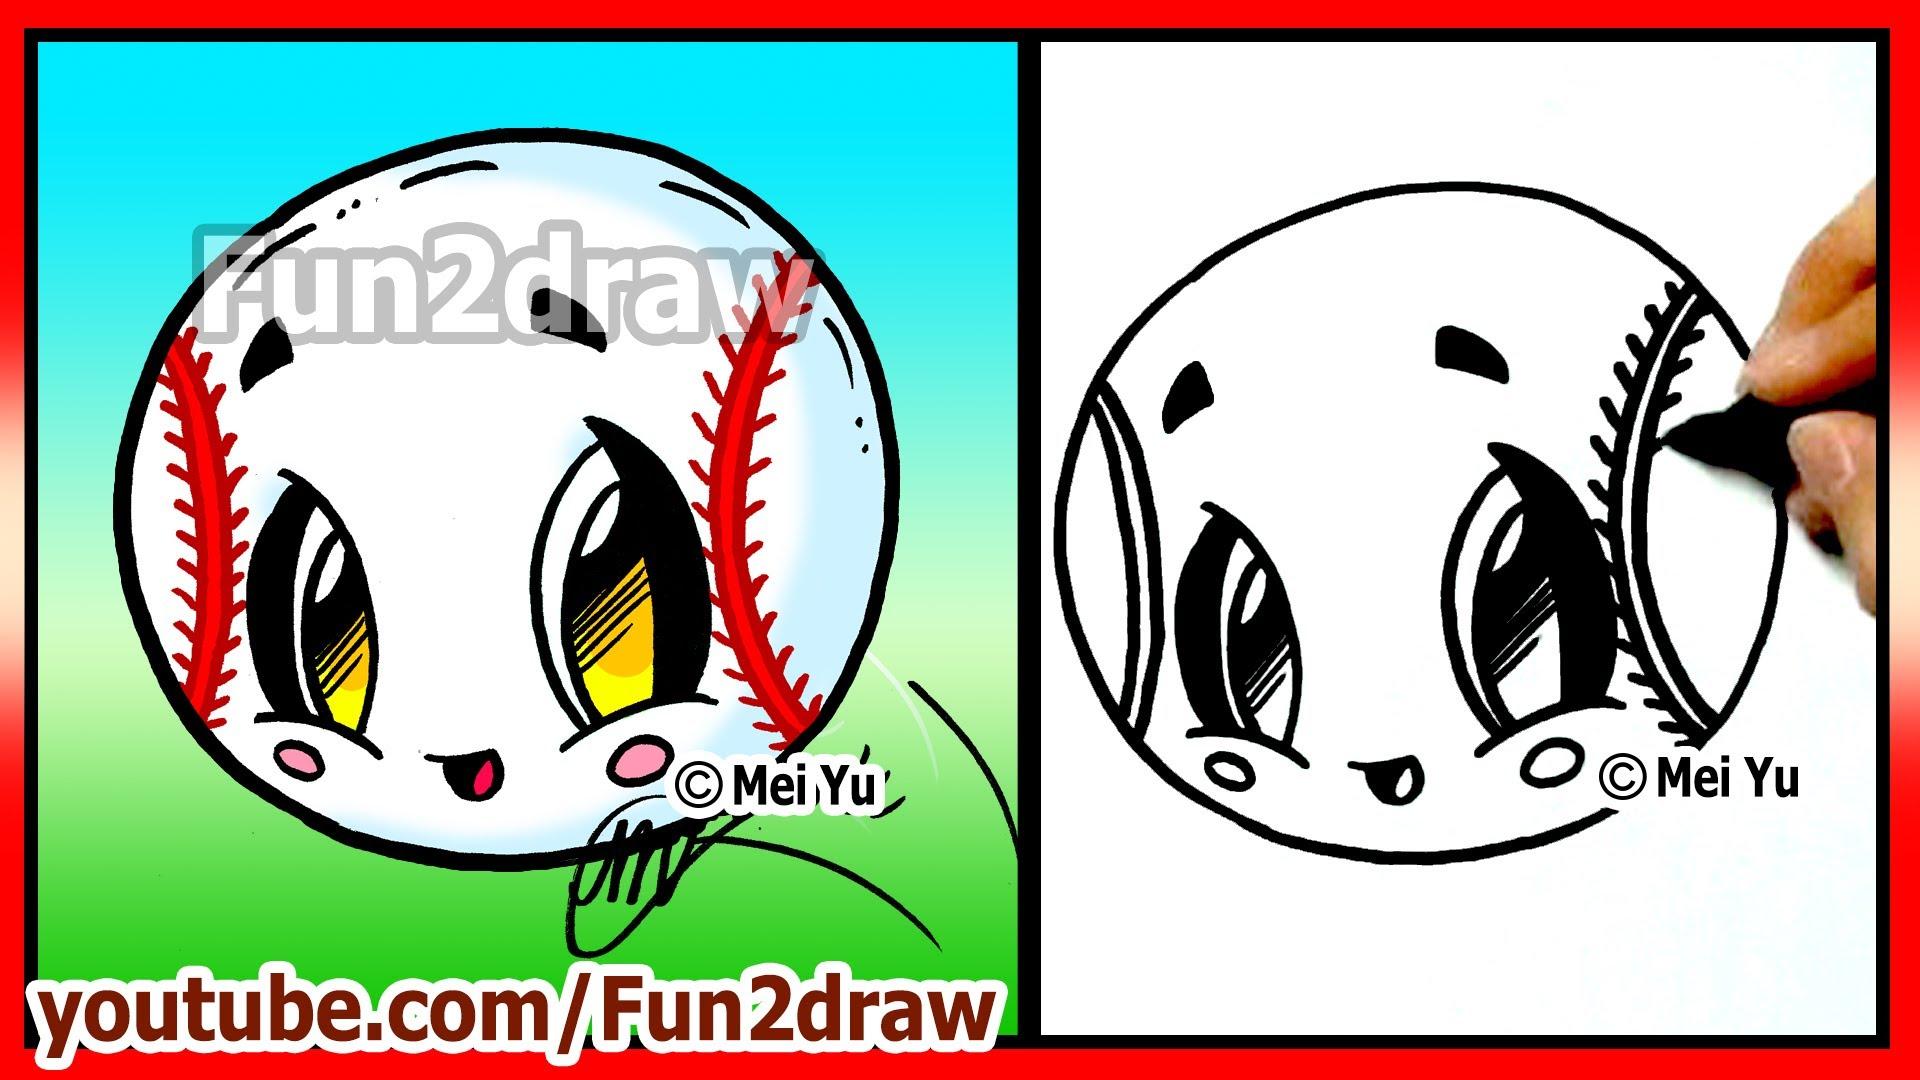 1920x1080 Softball Balks And Bat Drawing Collection